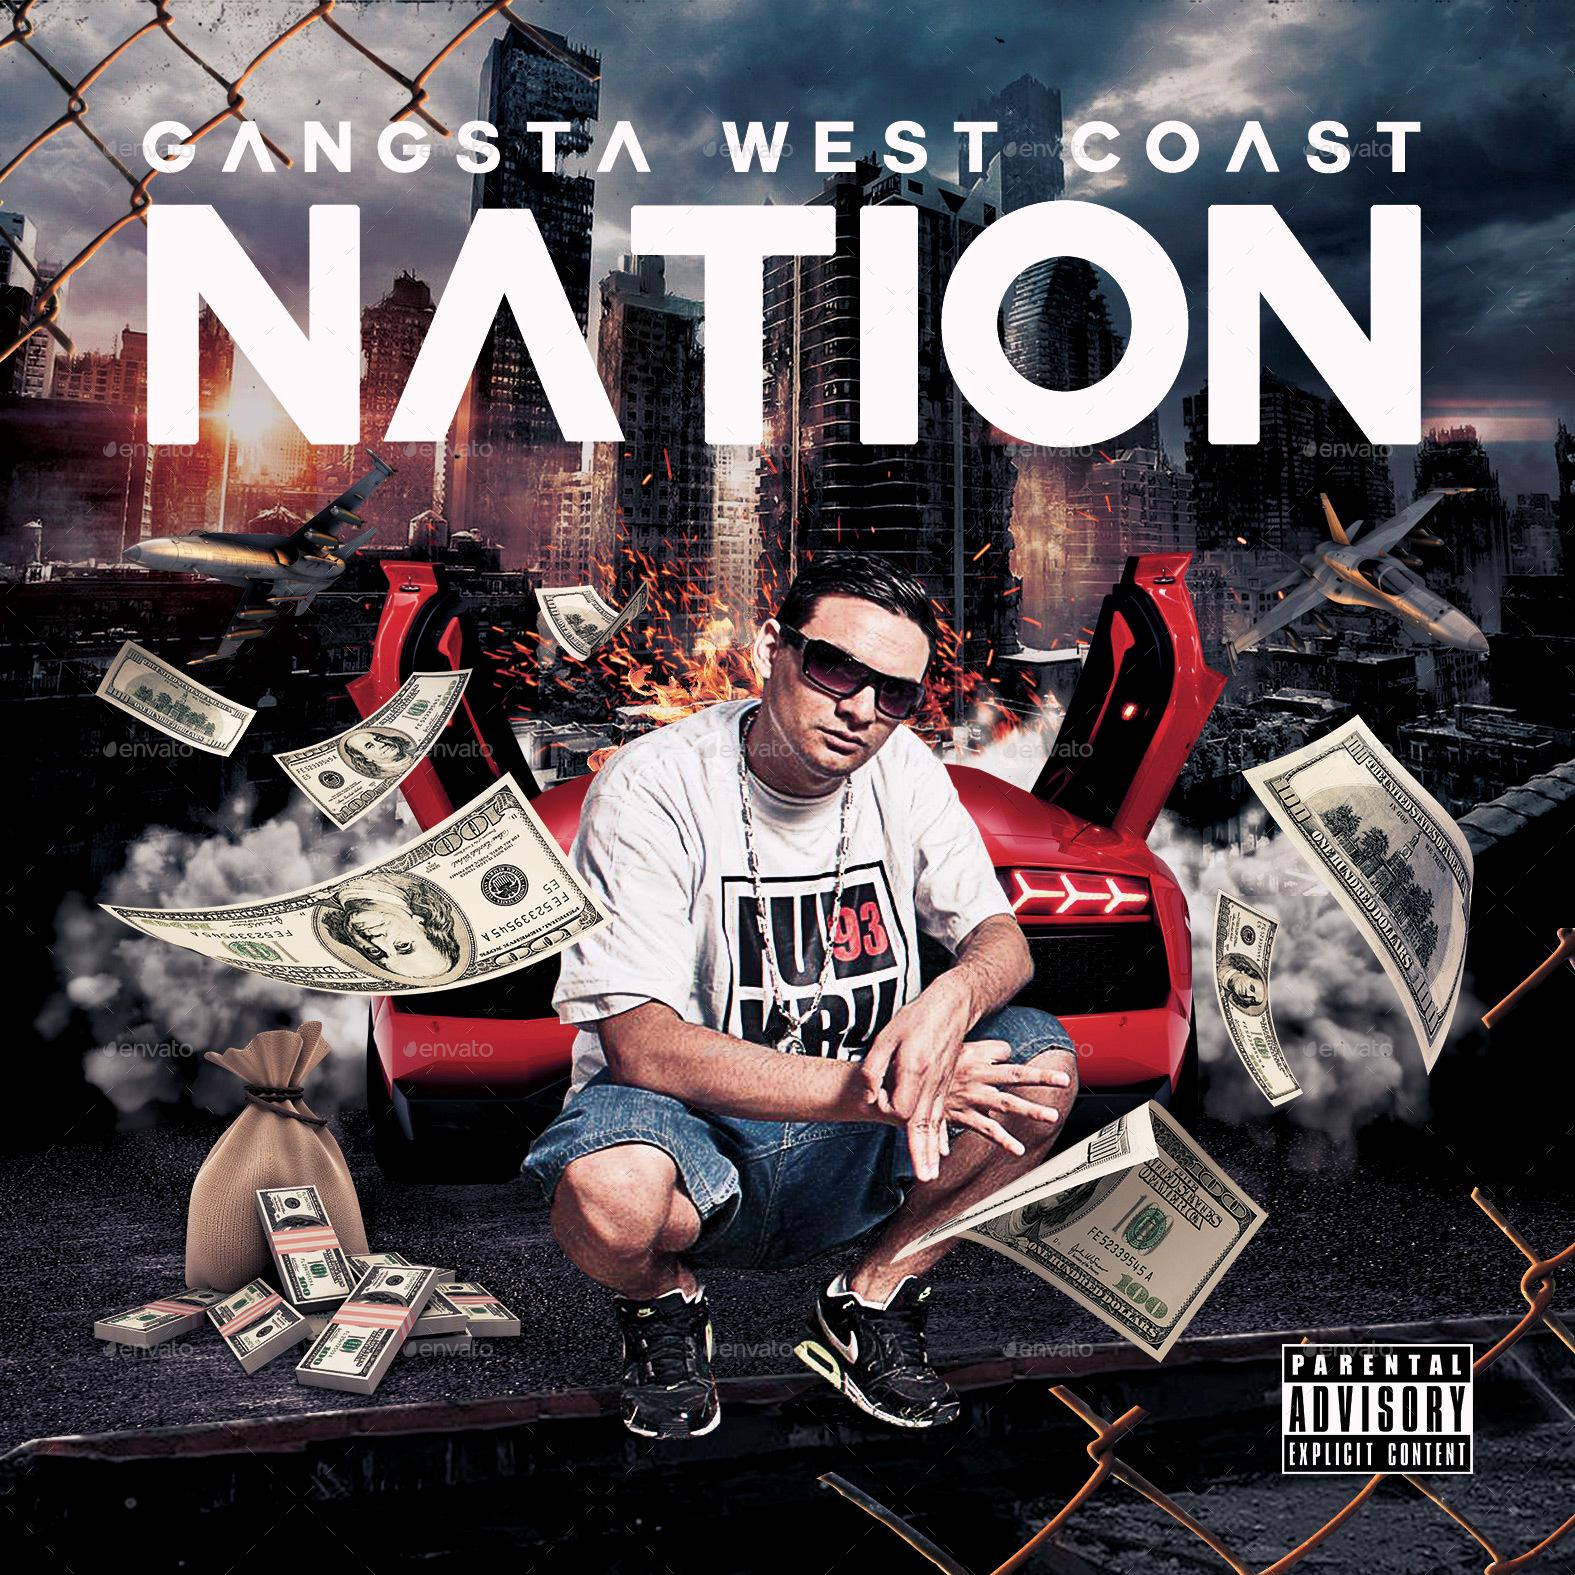 Wg West Coast Font: Gangsta West Coast CD Cover By Hartmanns